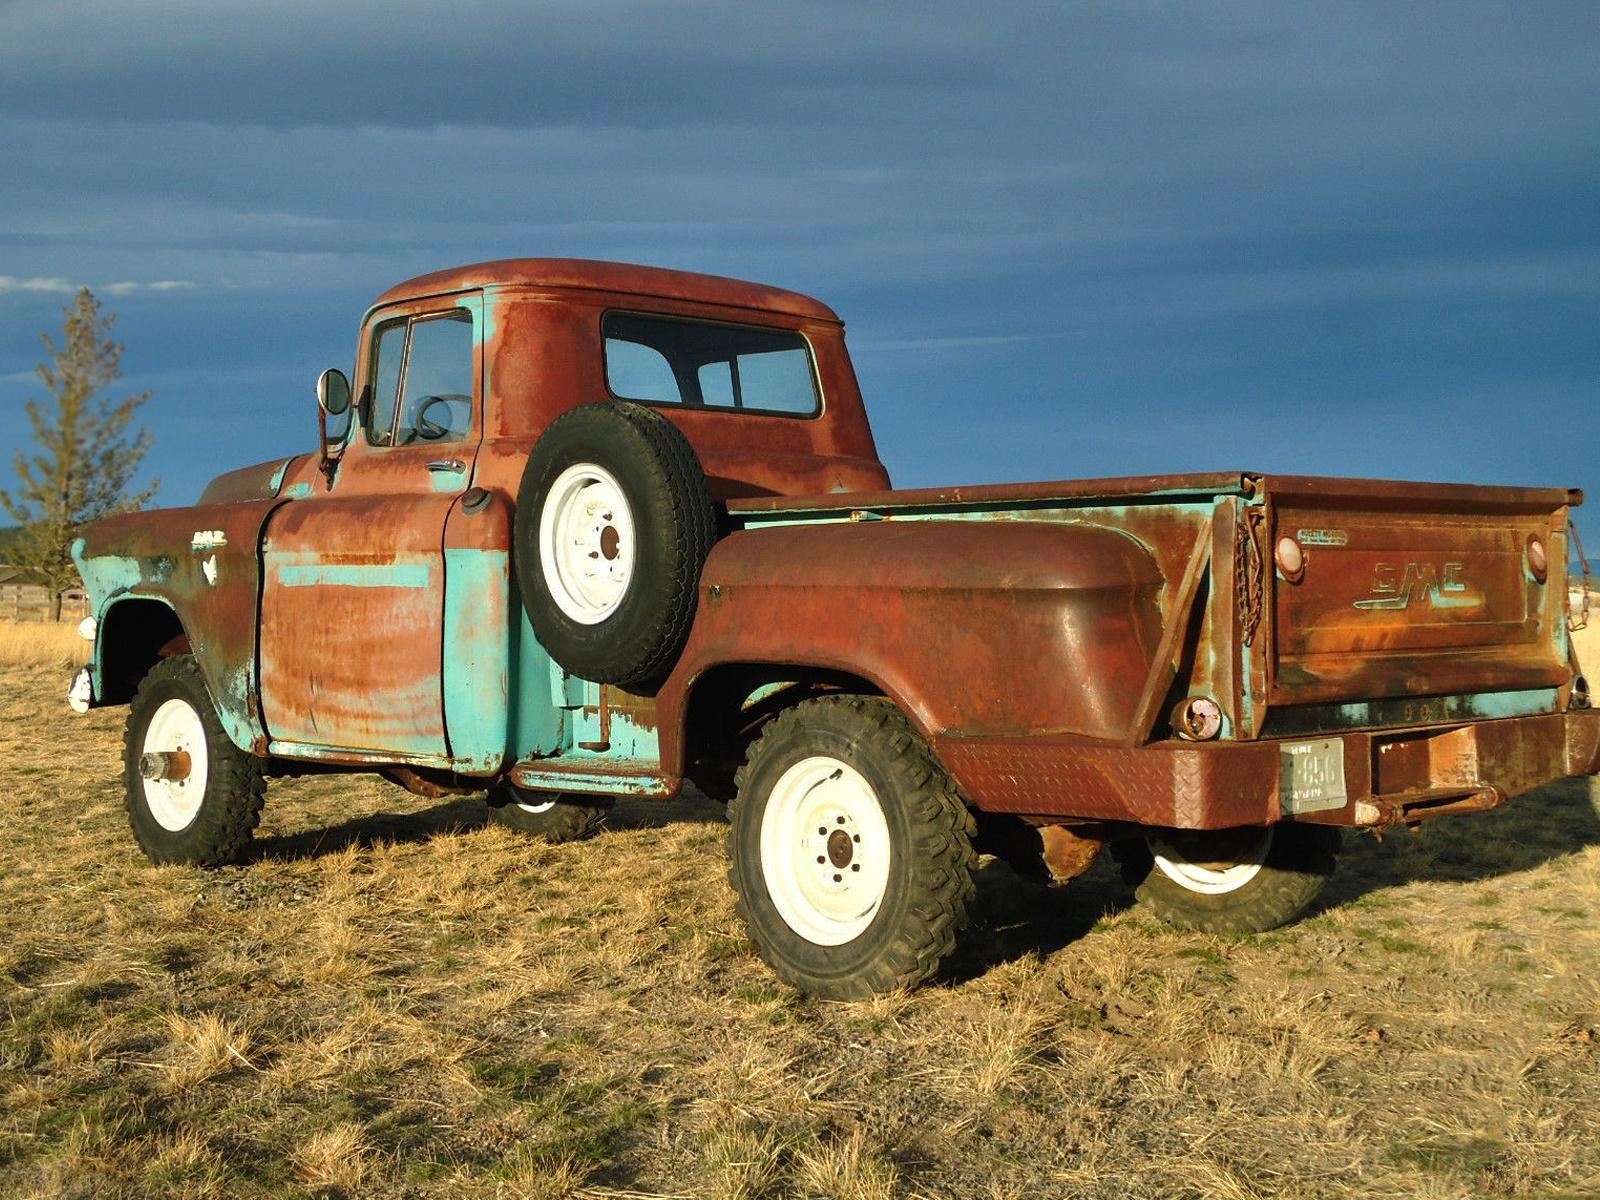 Tough Mudder: 1956 GMC 100 Series NAPCO 4x4